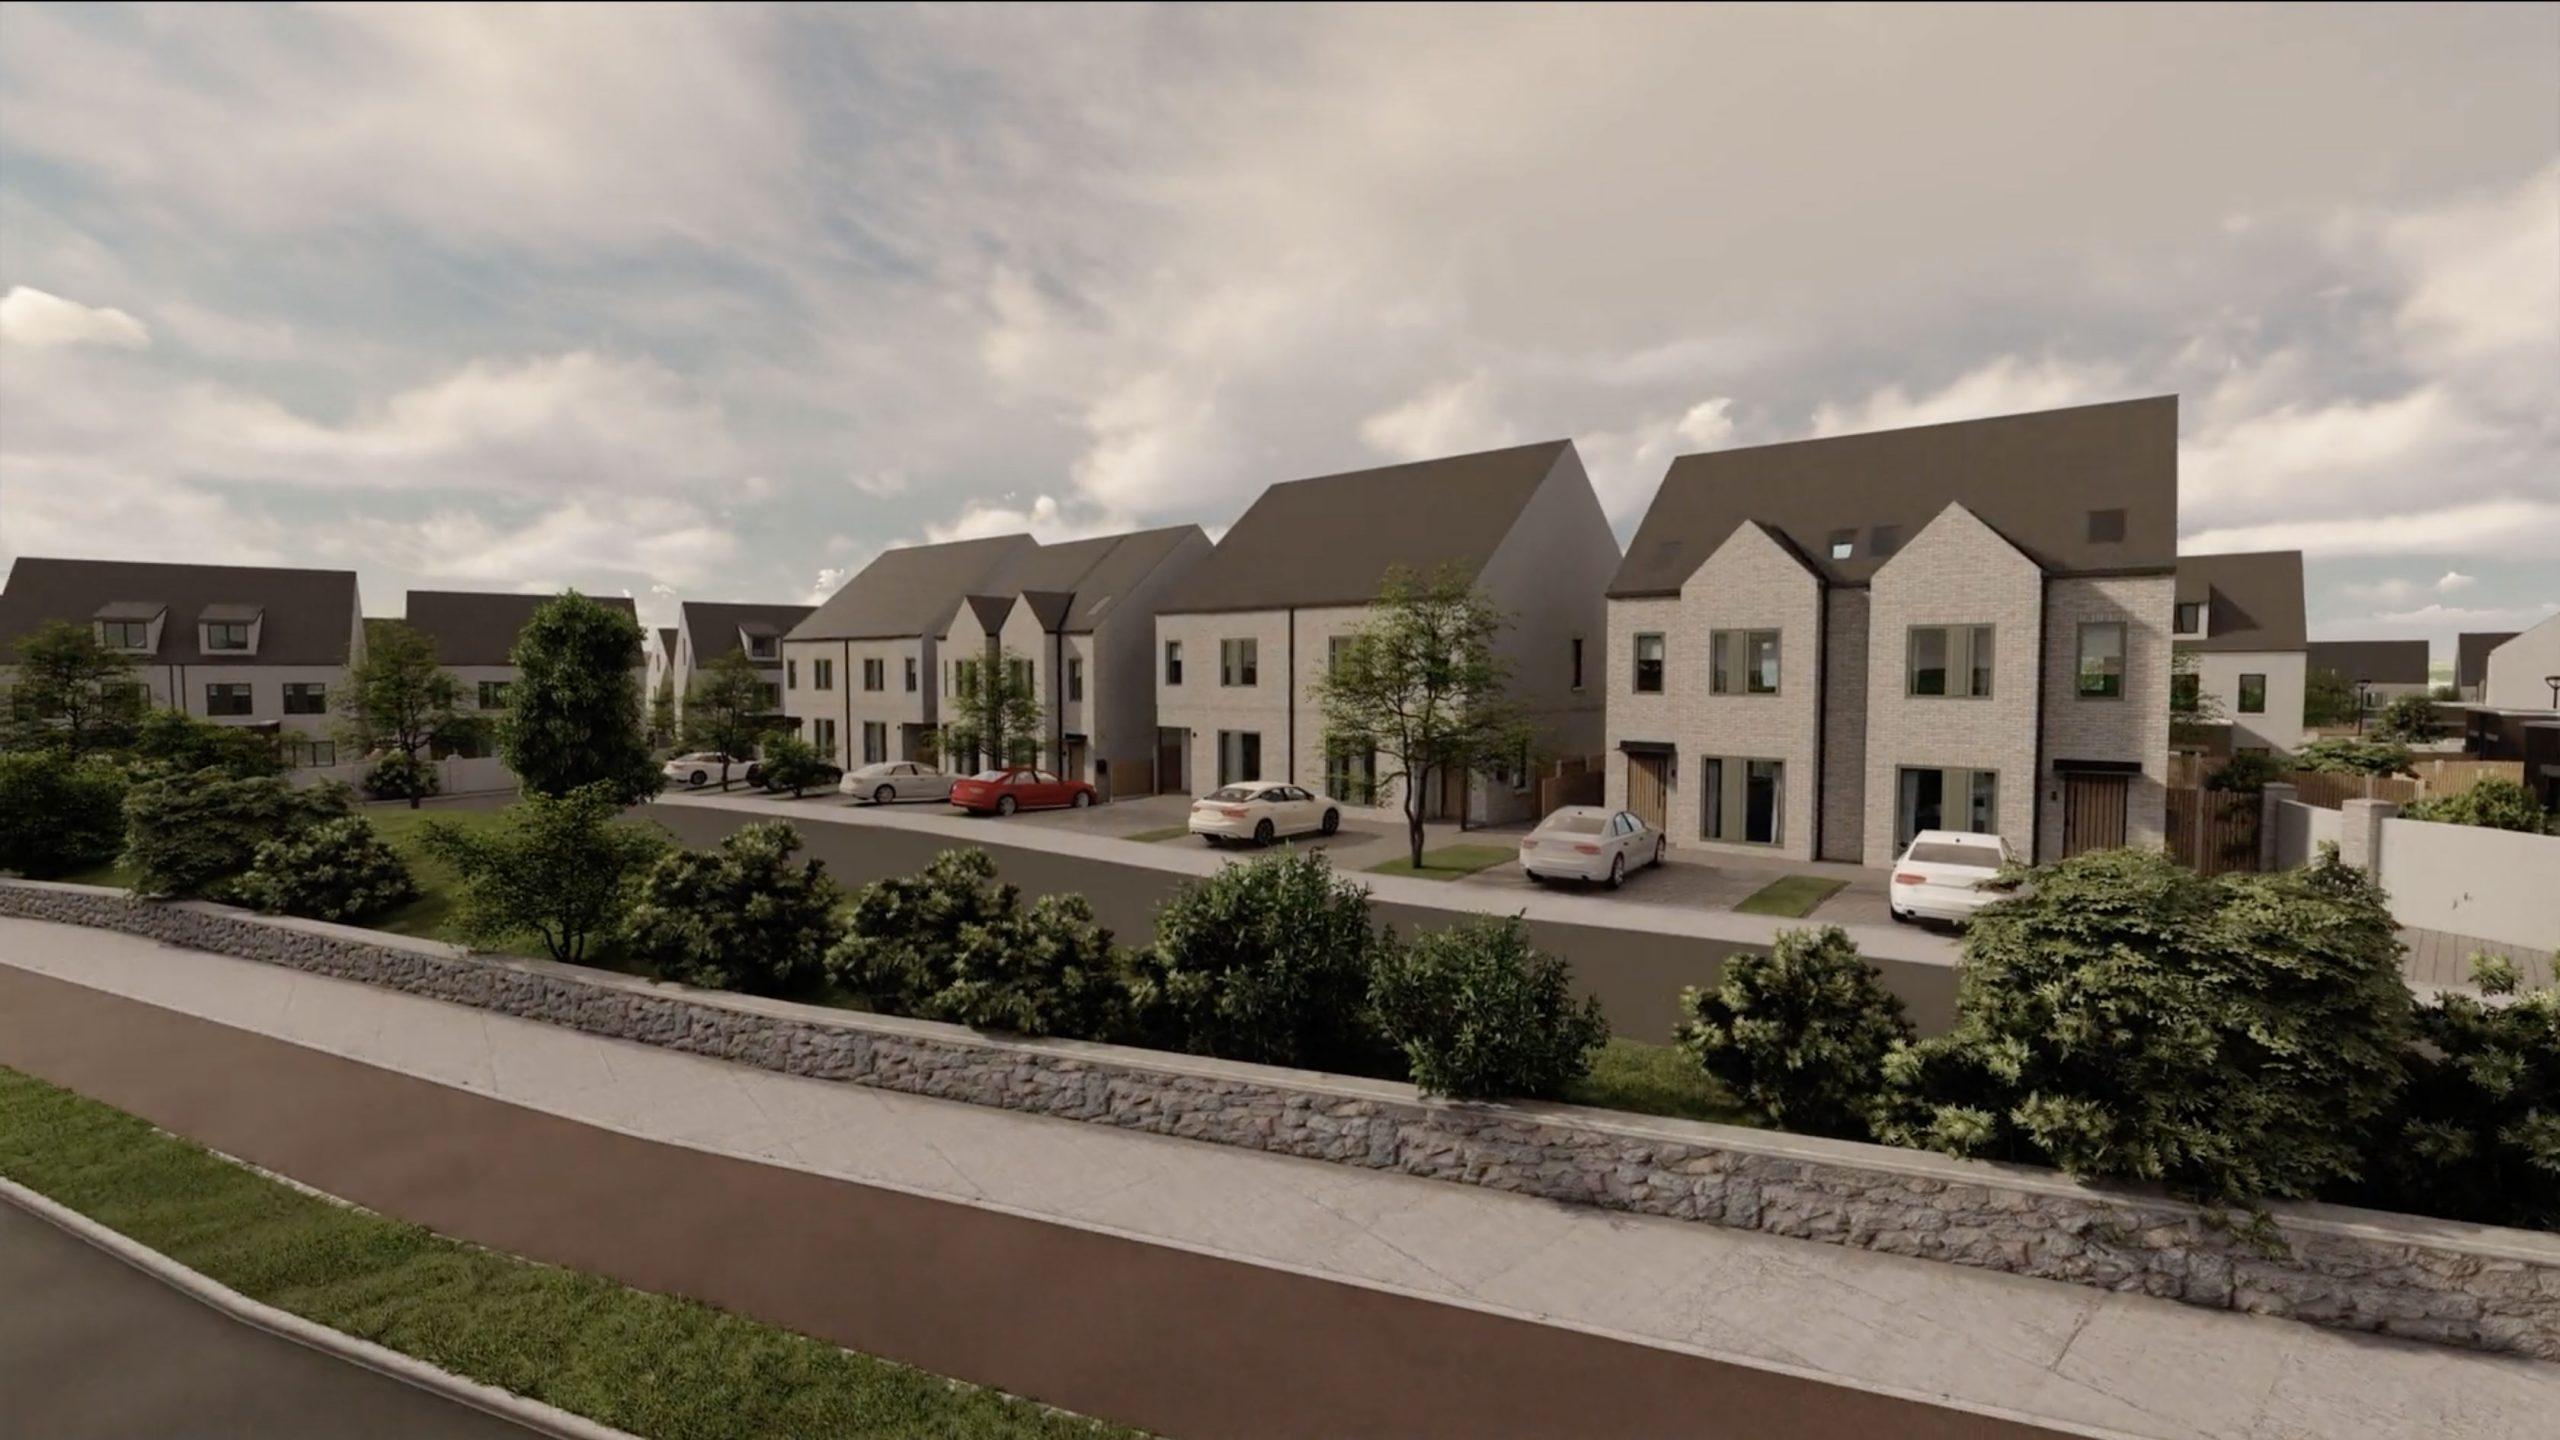 Summerfields Sustainable Housing